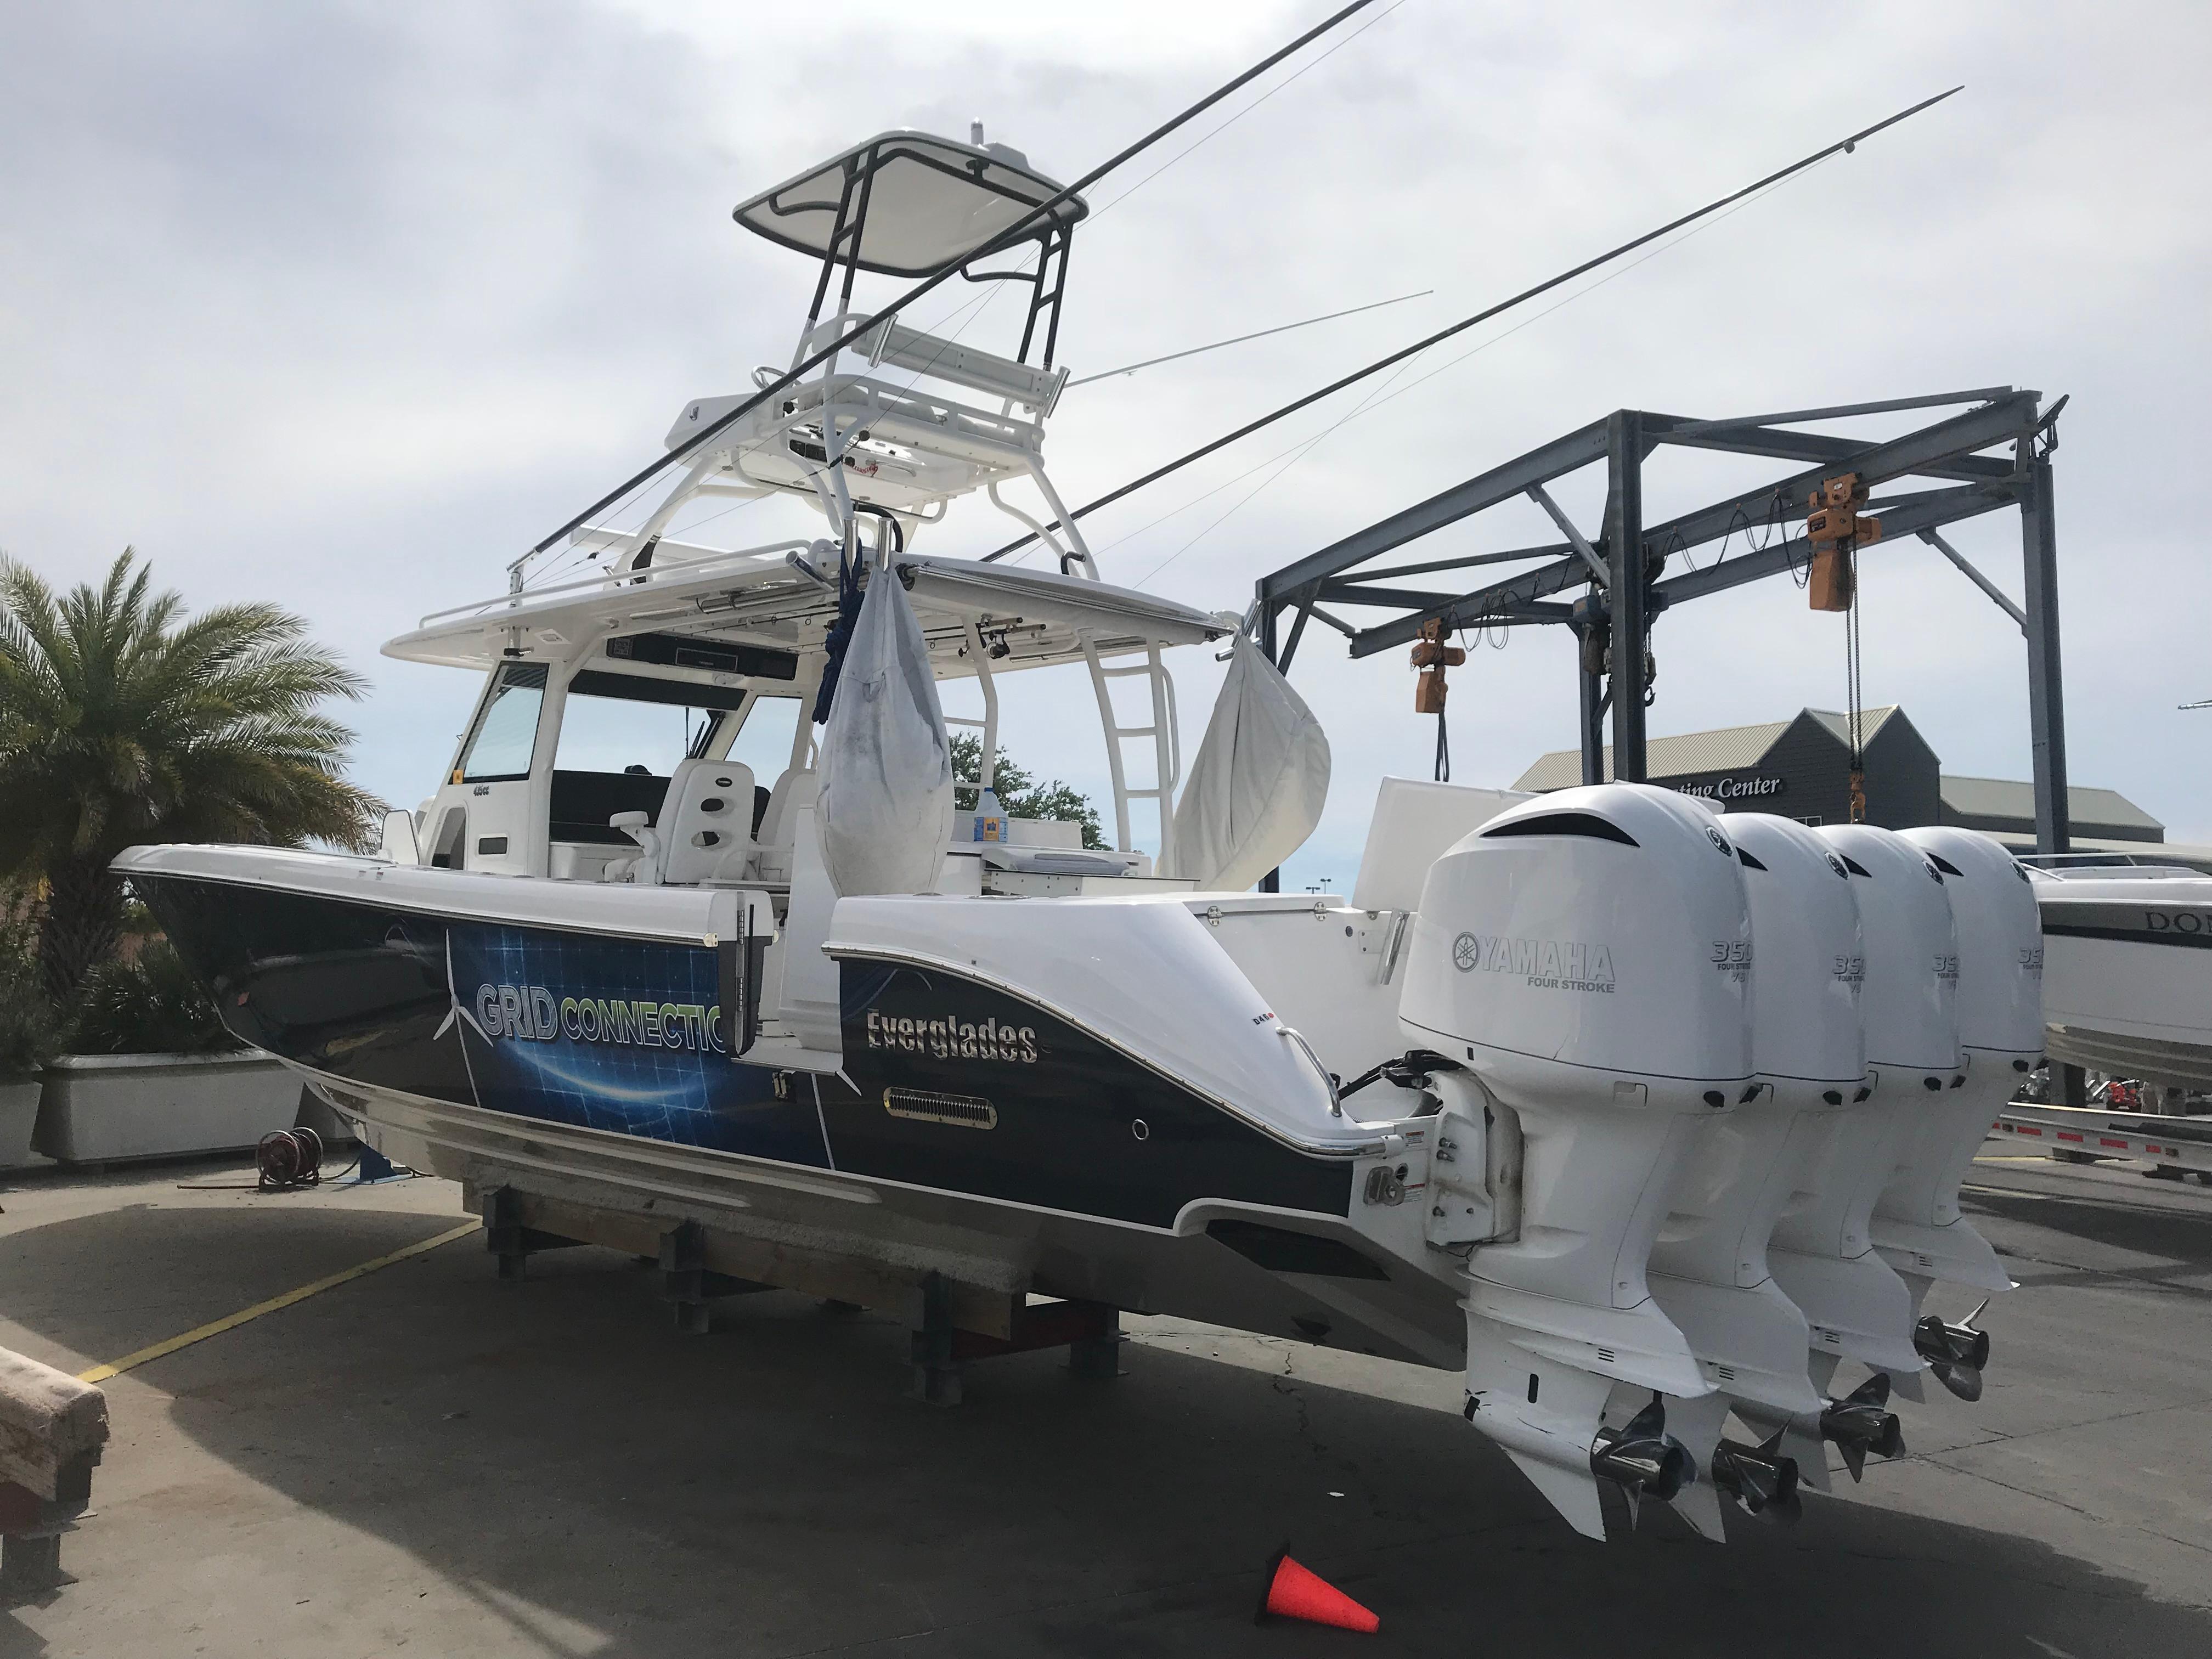 Grid Connection 2016 43 Everglades Starboard Quarter